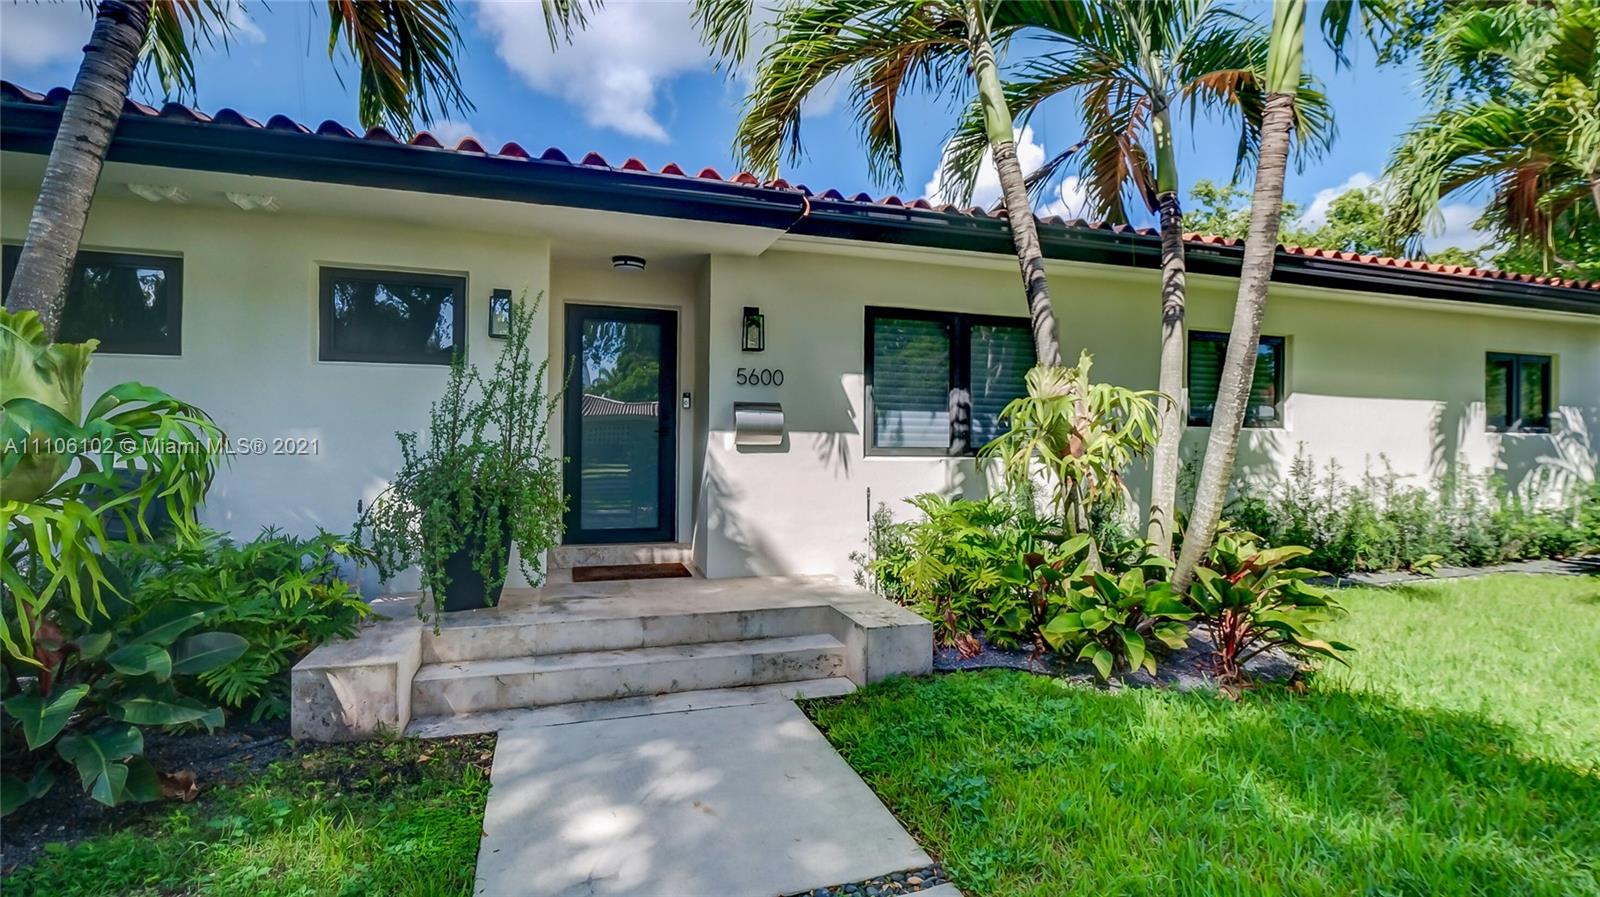 South Miami - 5600 SW Alhambra Cir, Coral Gables, FL 33146